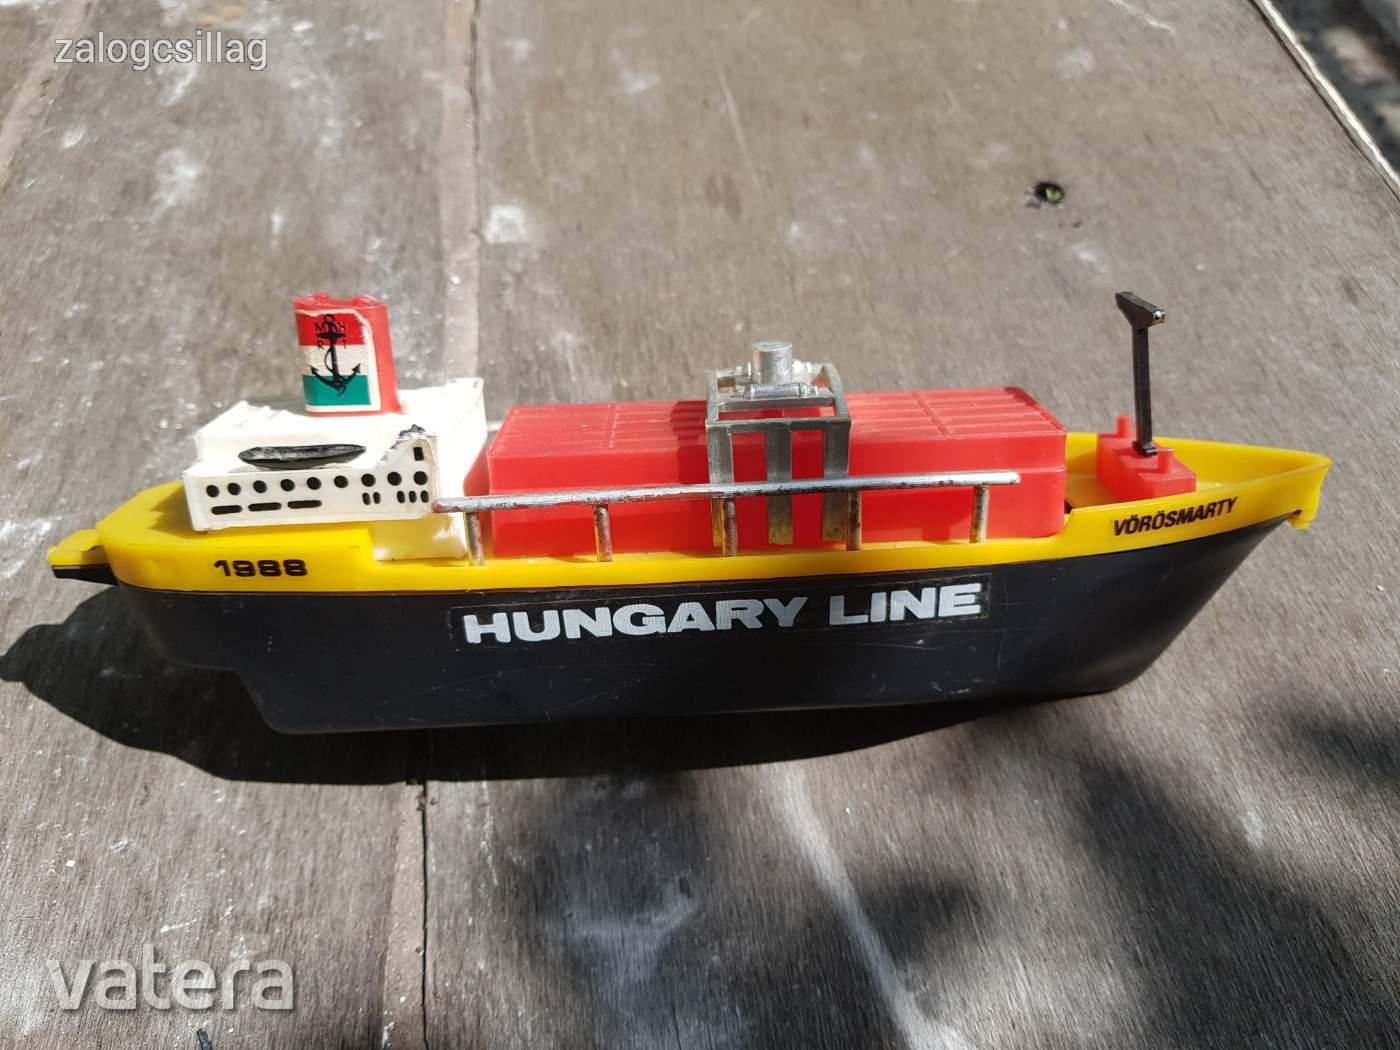 retro-muanyag-hajo-1988-hungary-line-vorosmarty-007a_2_big.jpg